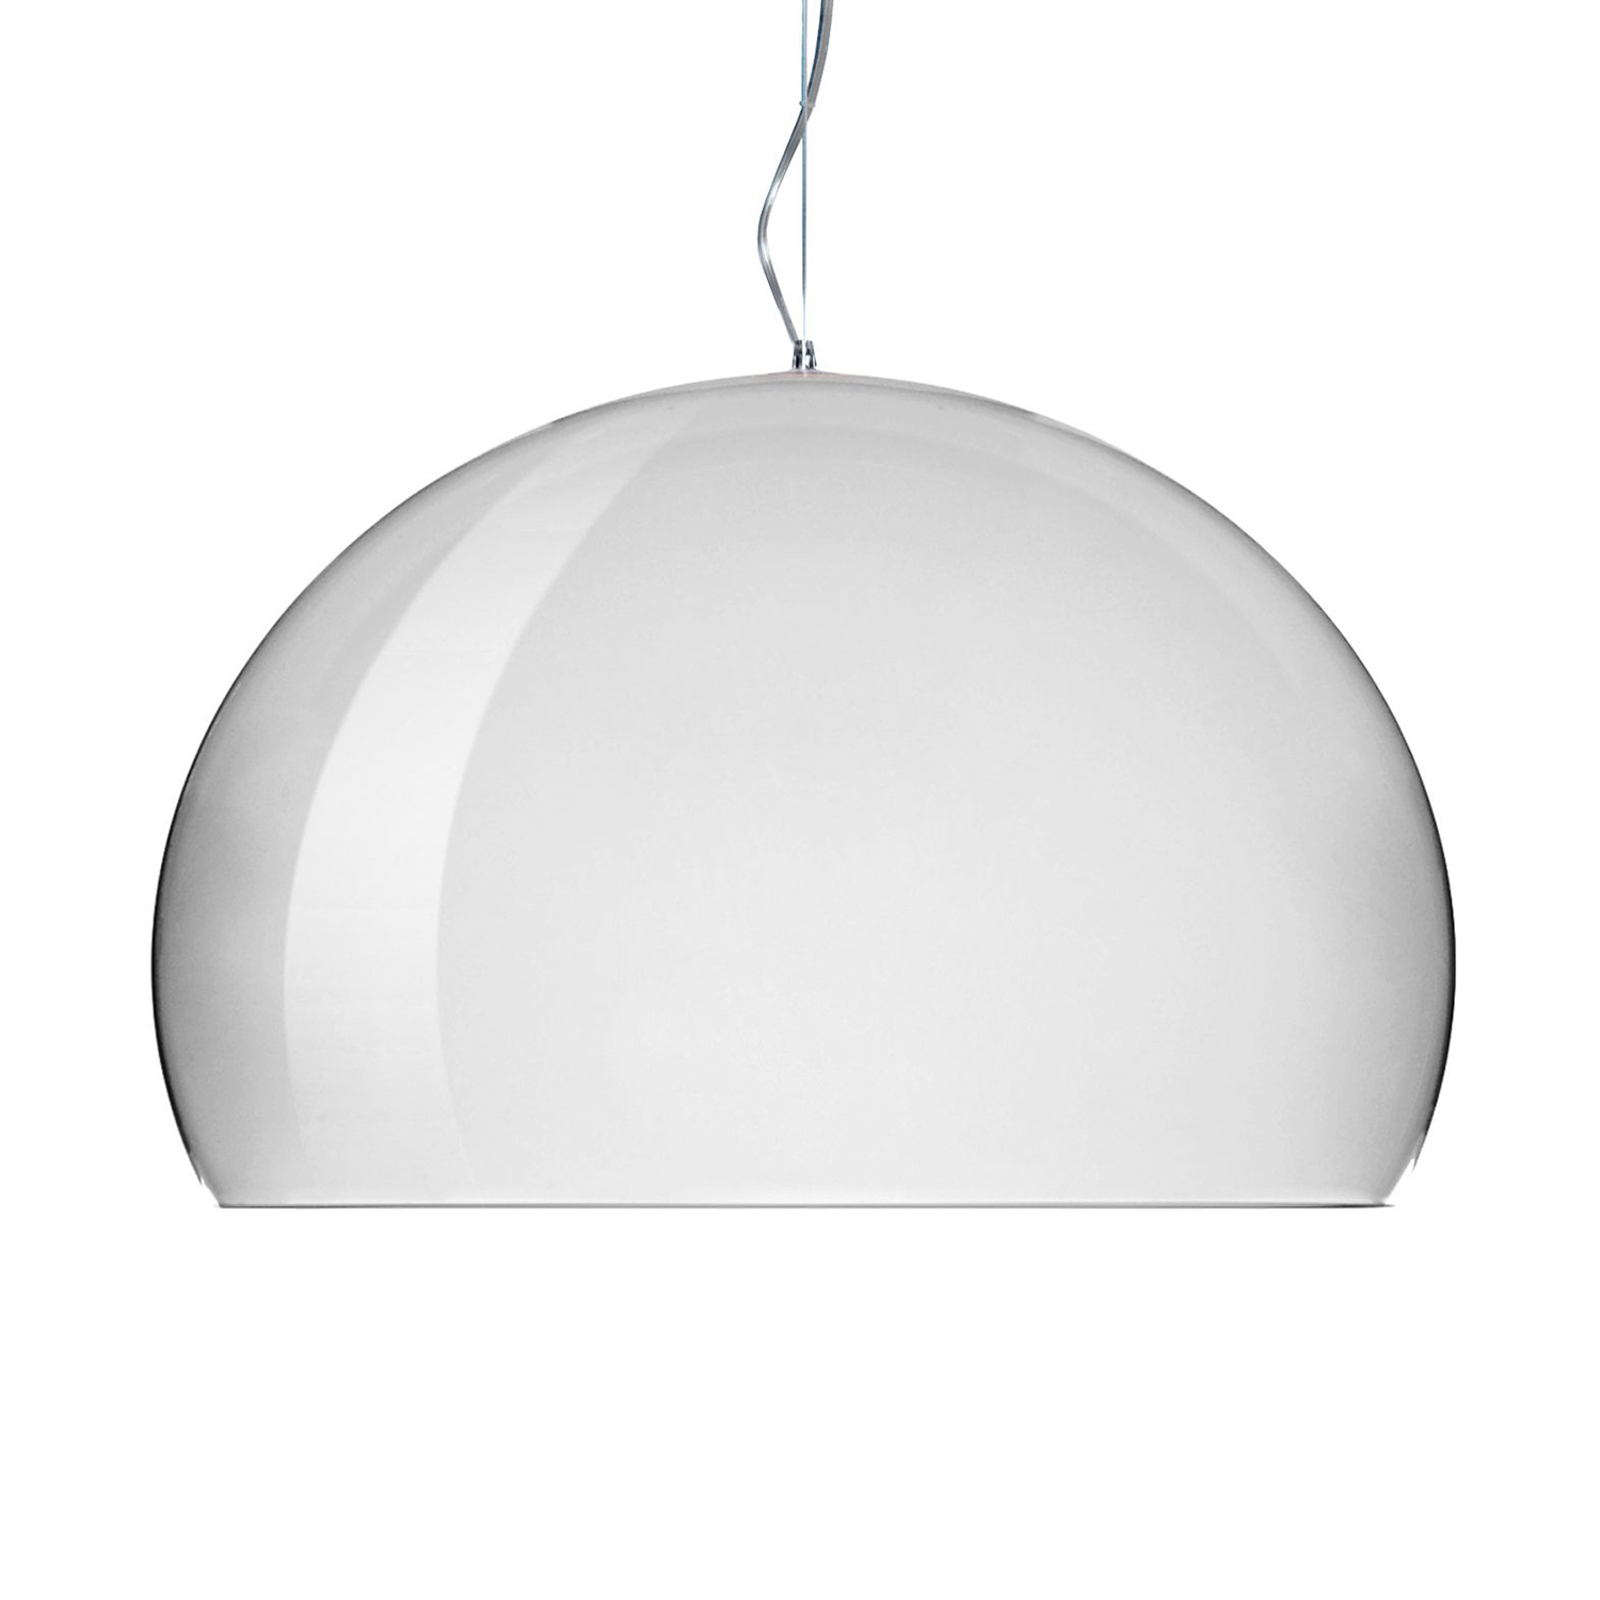 Kartell FL/Y - LED-Pendellampe, chrom glänzend